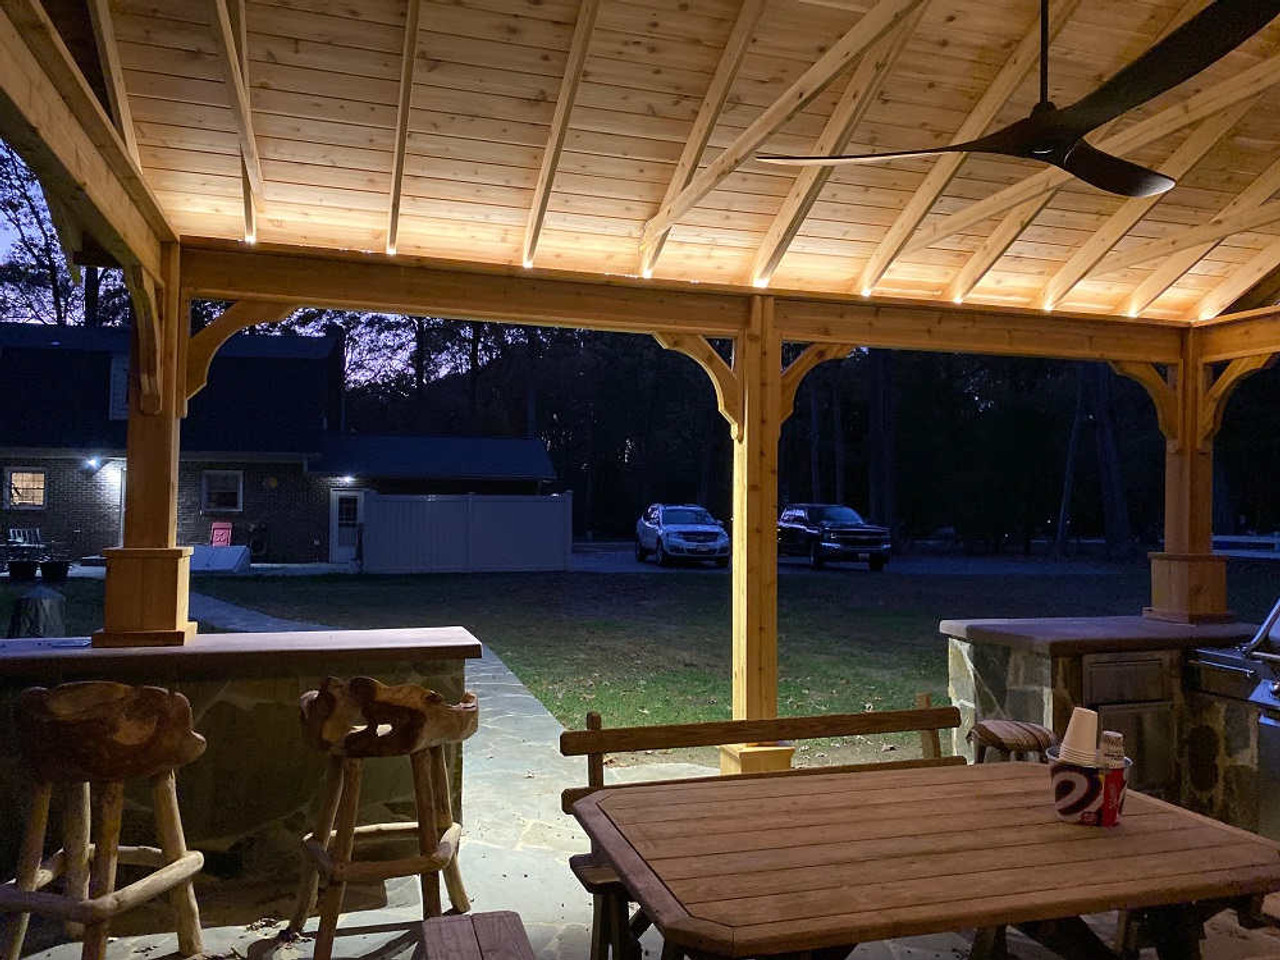 16x20 Red Cedar Gable Roof Pavilion Kit with cool LED tape light, White Plains, MD